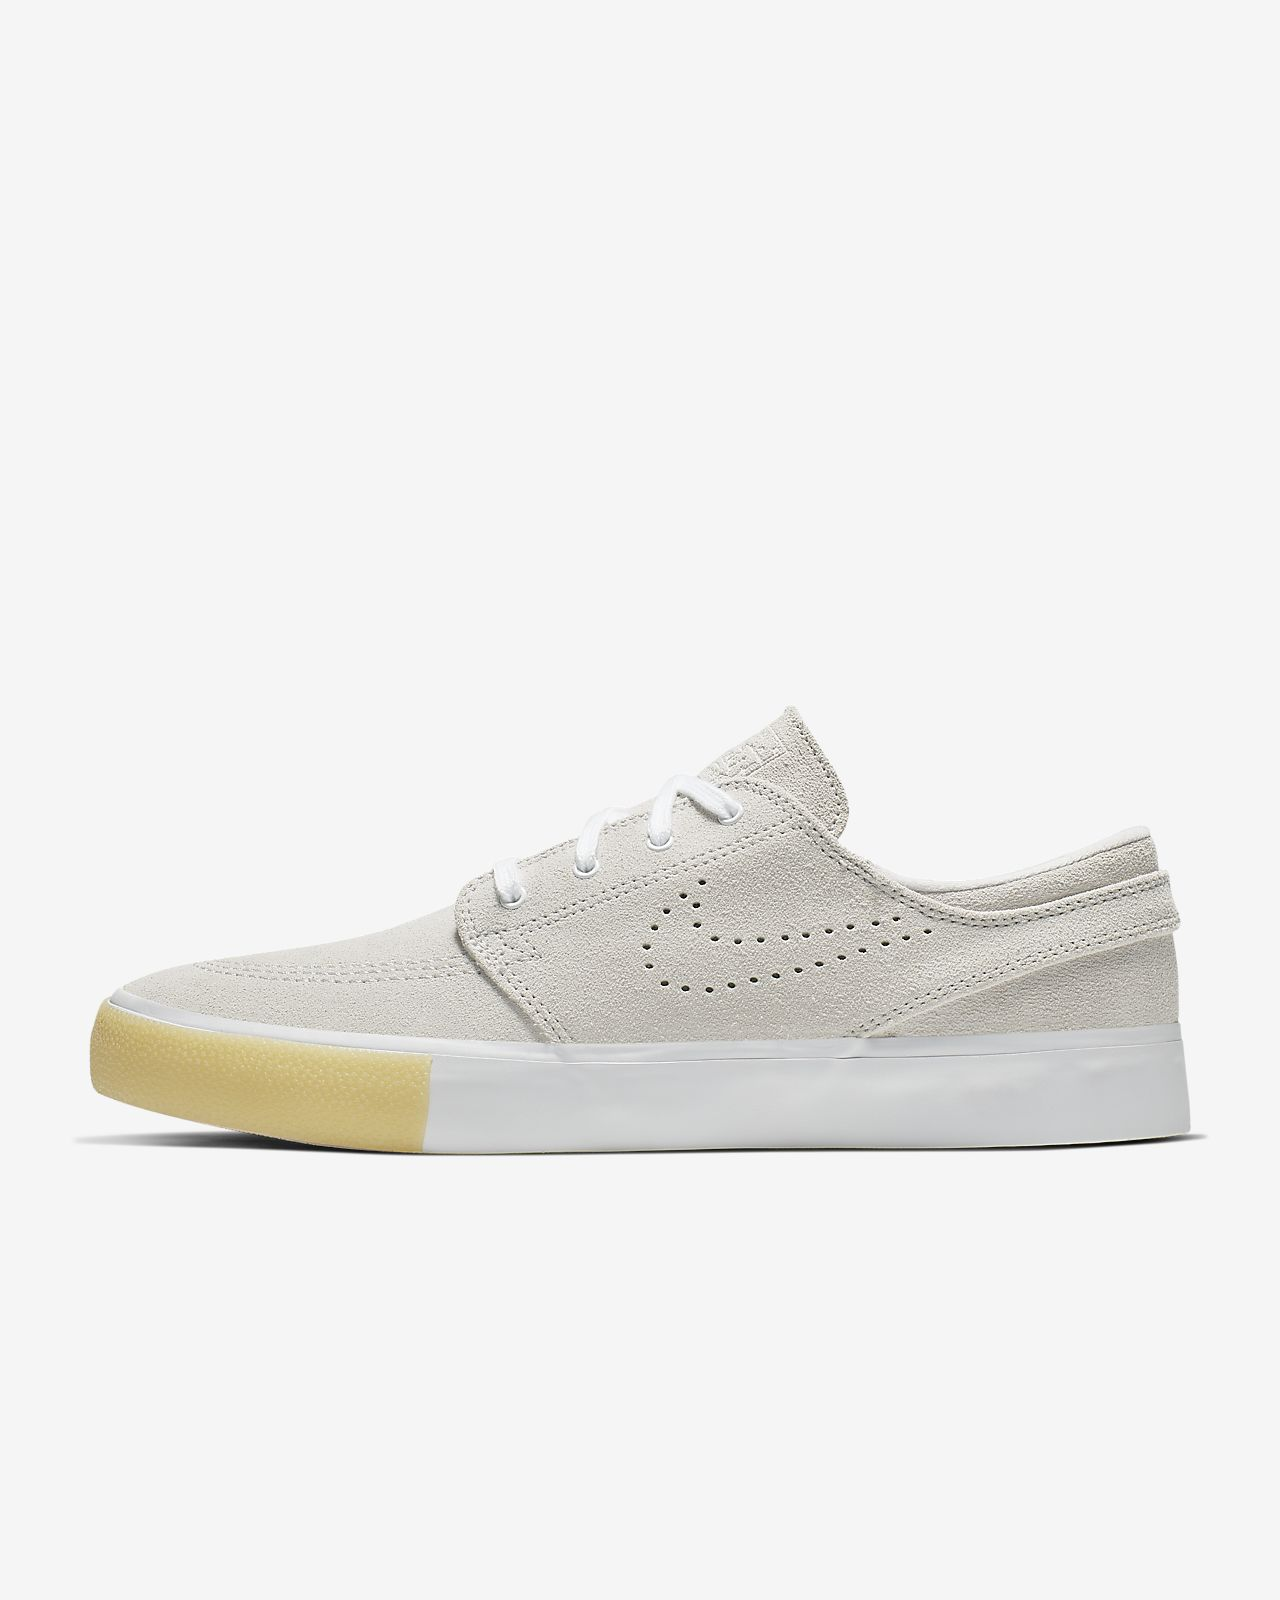 Nike SB Zoom Stefan Janoski RM SE Skateboardschuh